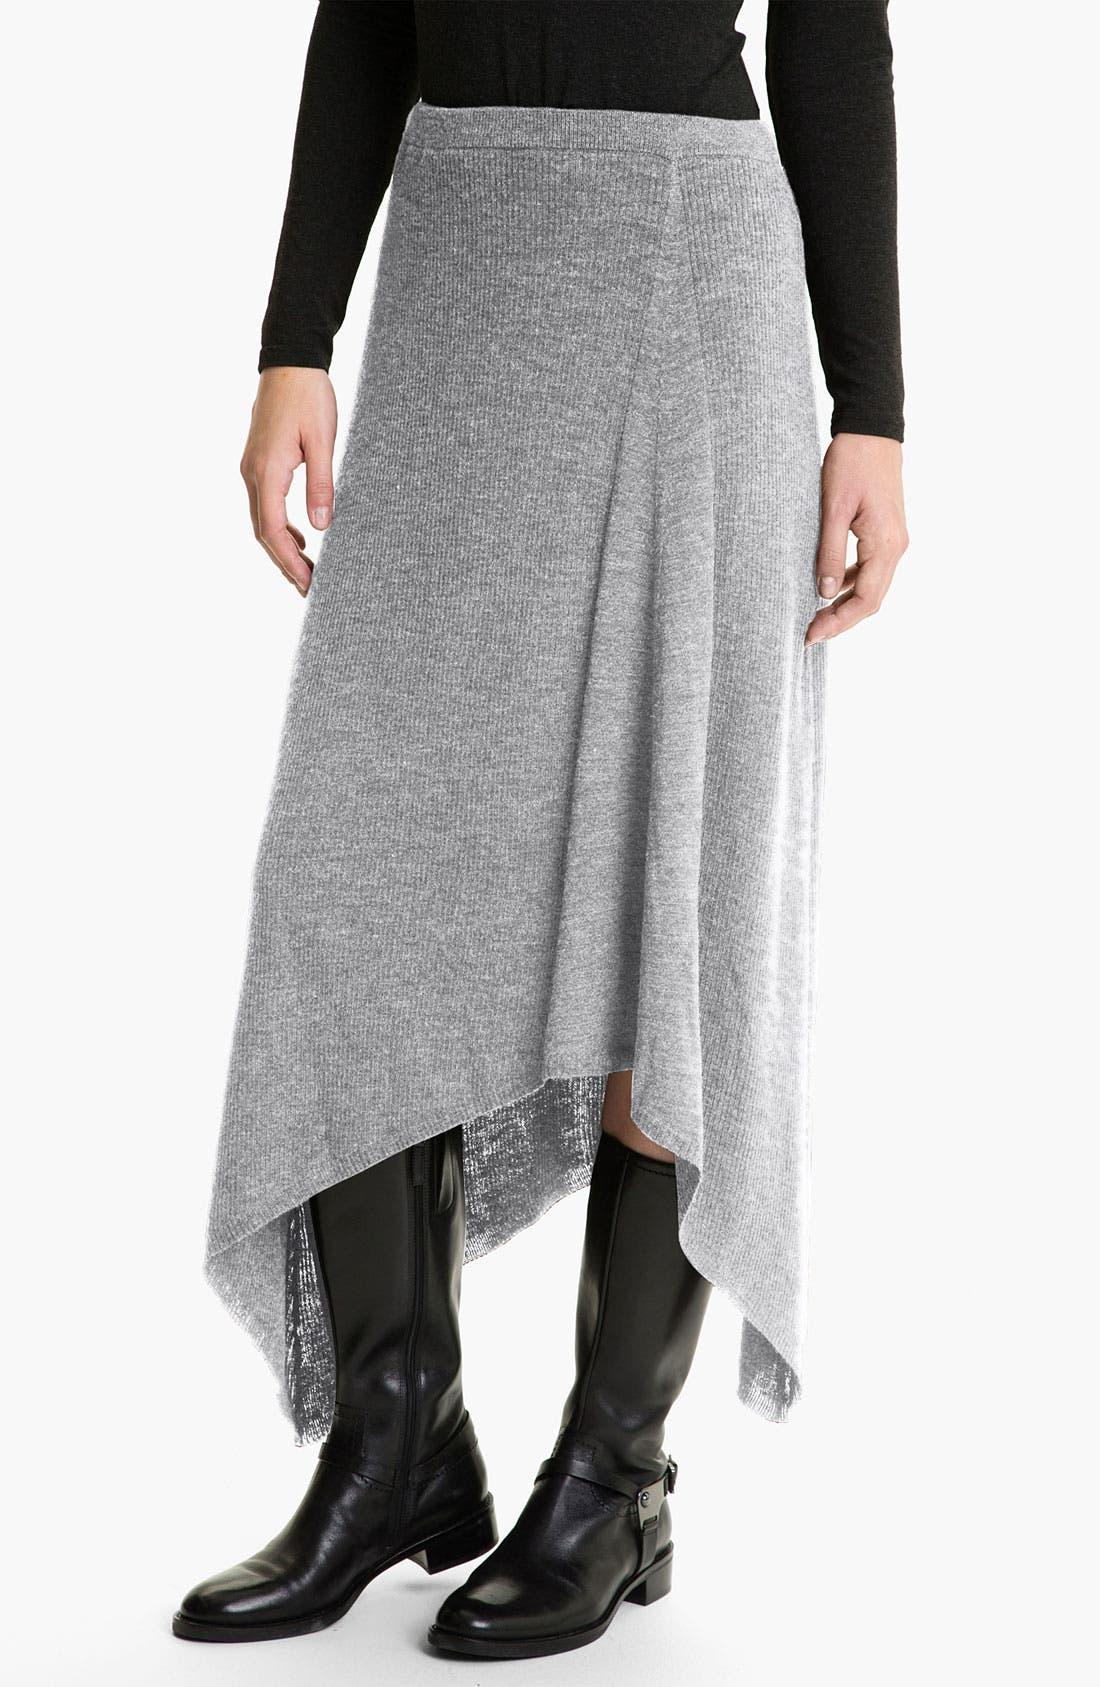 Main Image - Eileen Fisher Merino Jersey Rib Knit Skirt  (Online Exclusive)